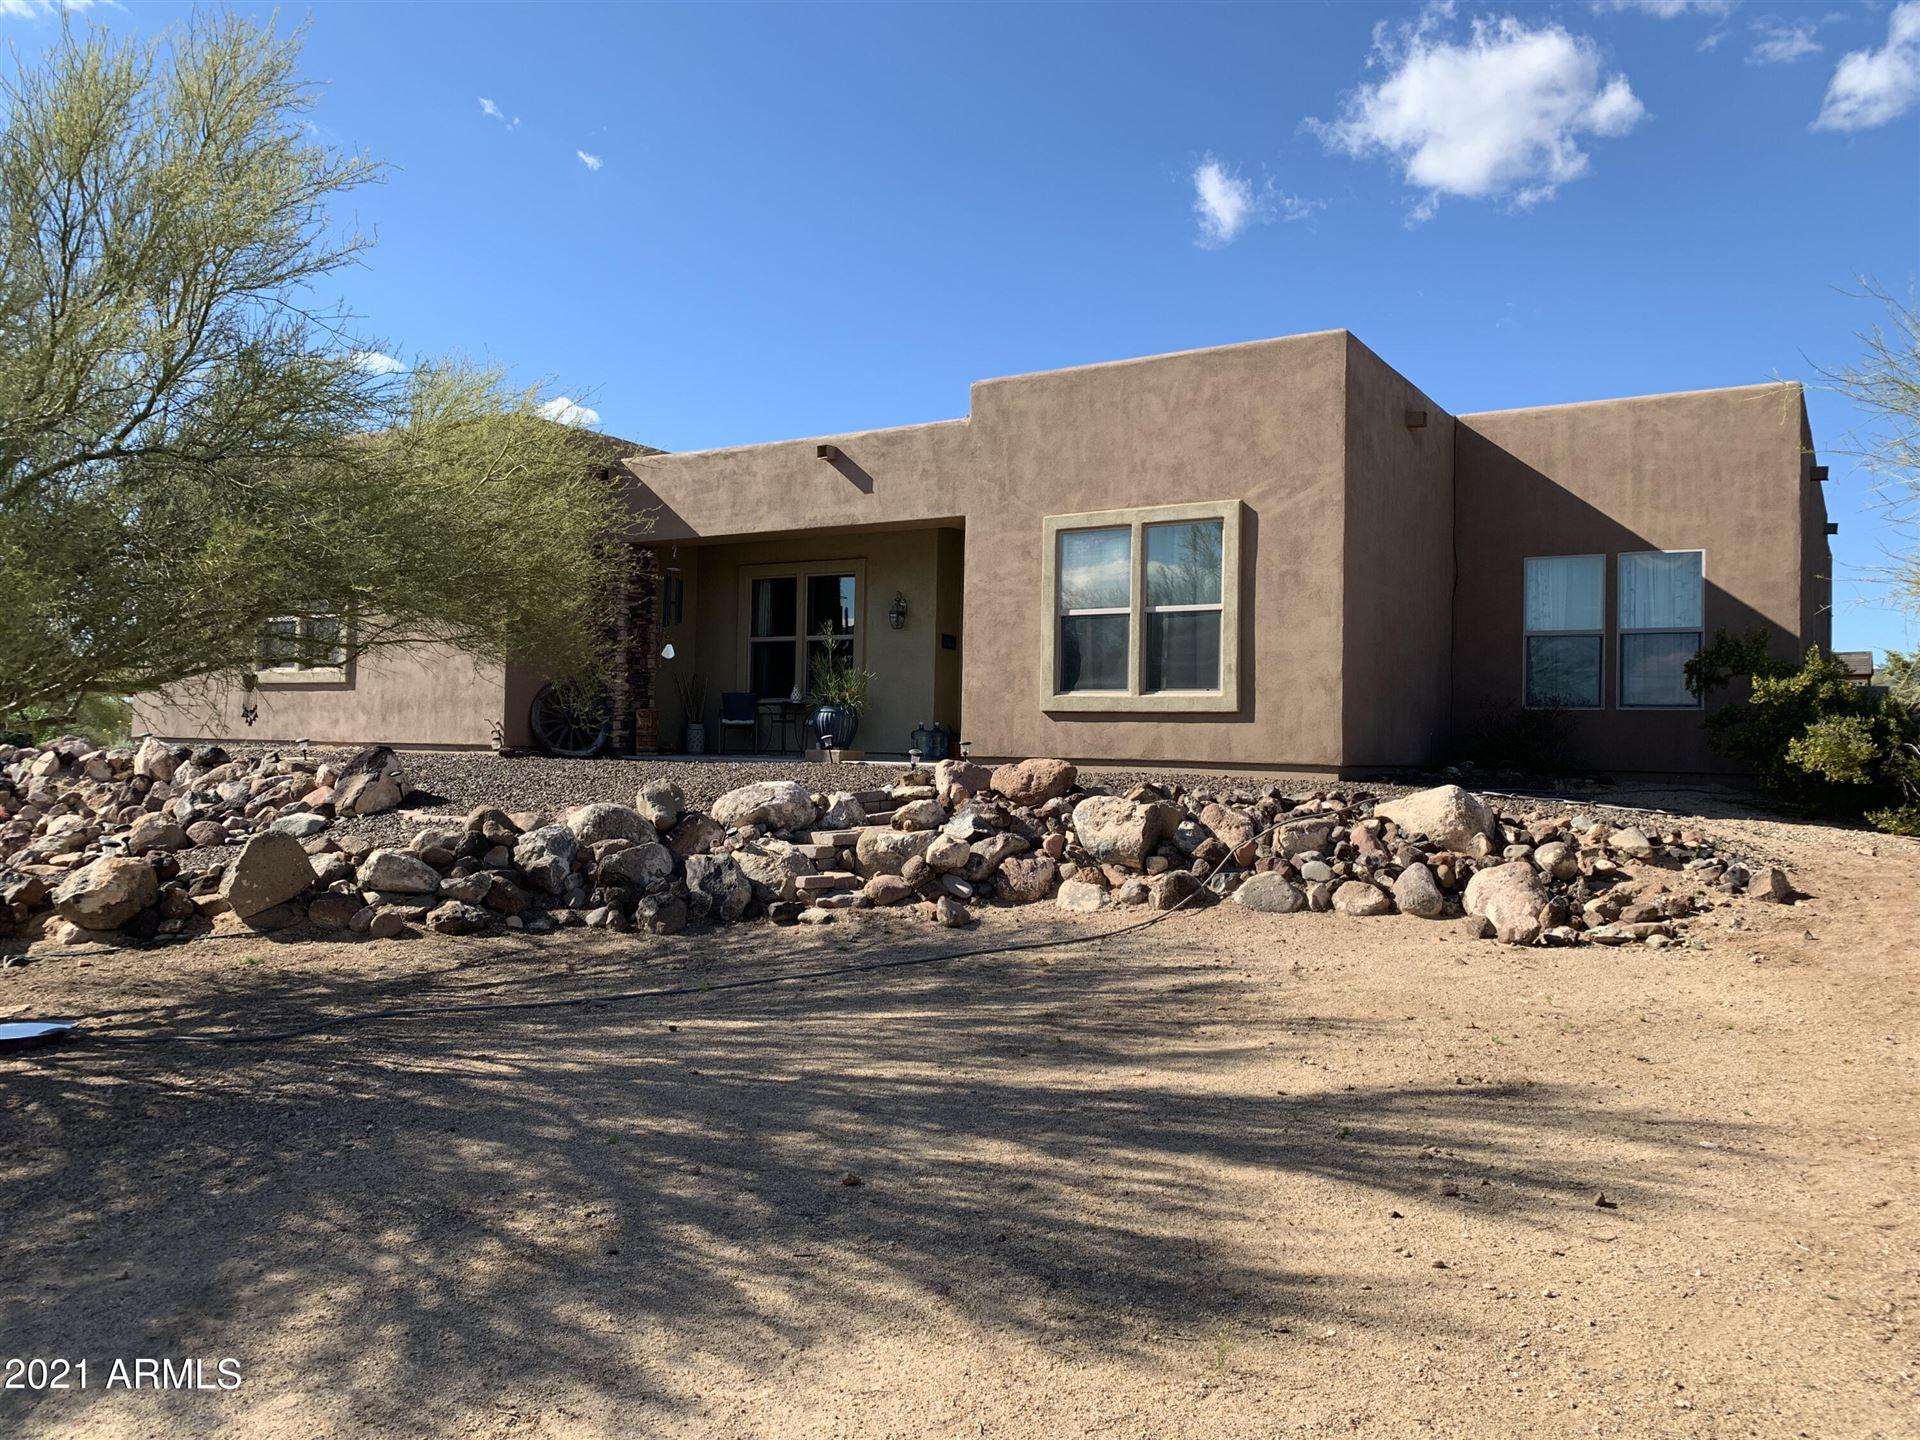 Photo of 44509 N 12TH Street, New River, AZ 85087 (MLS # 6290775)